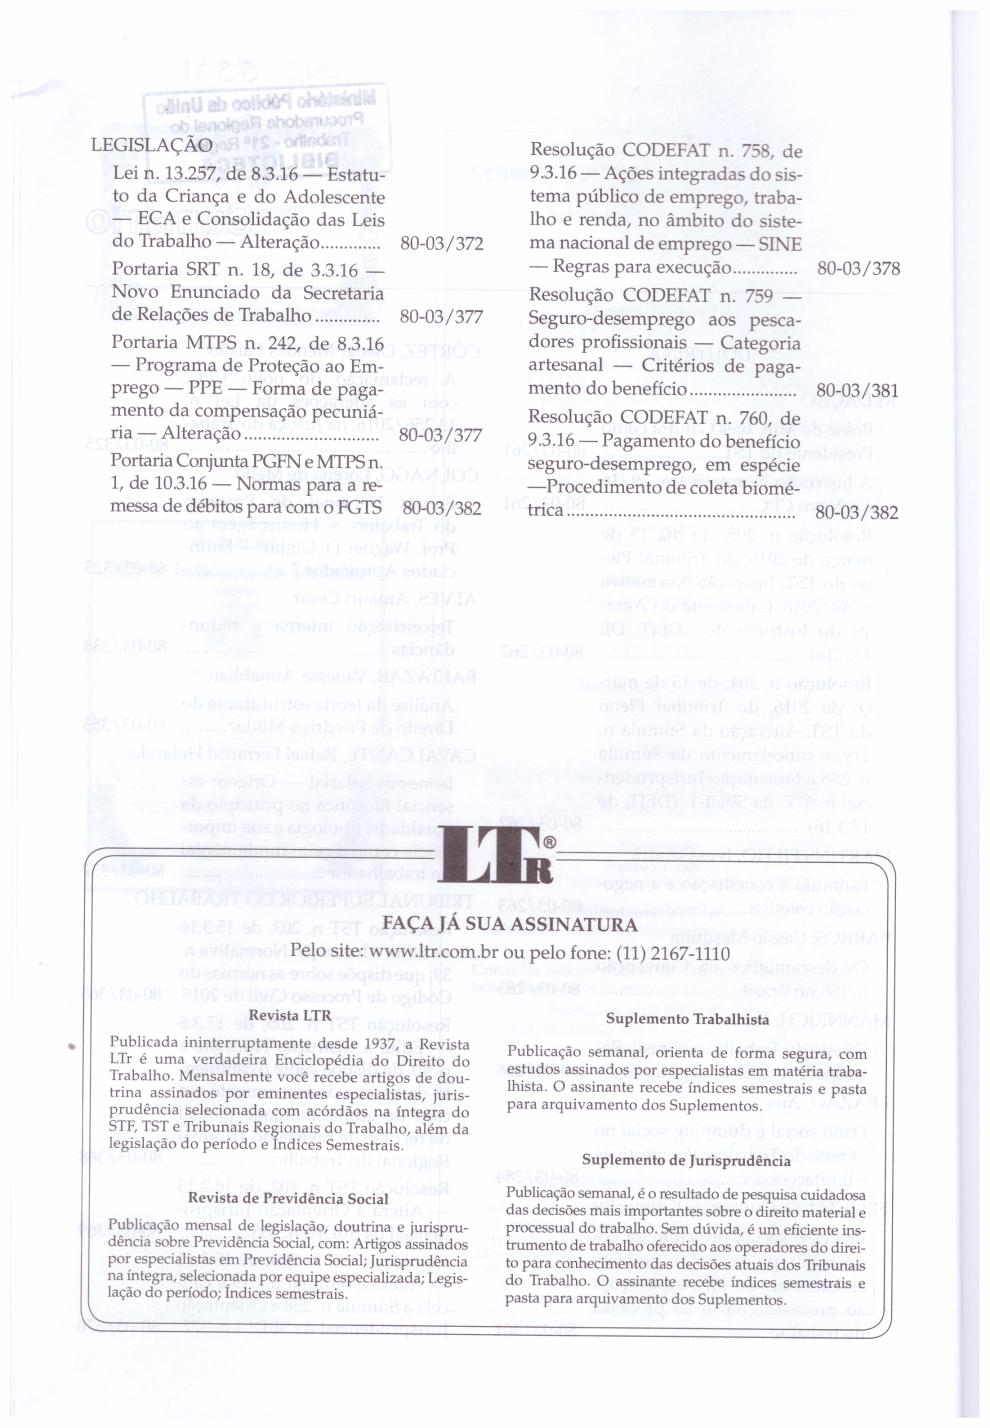 LTr_002